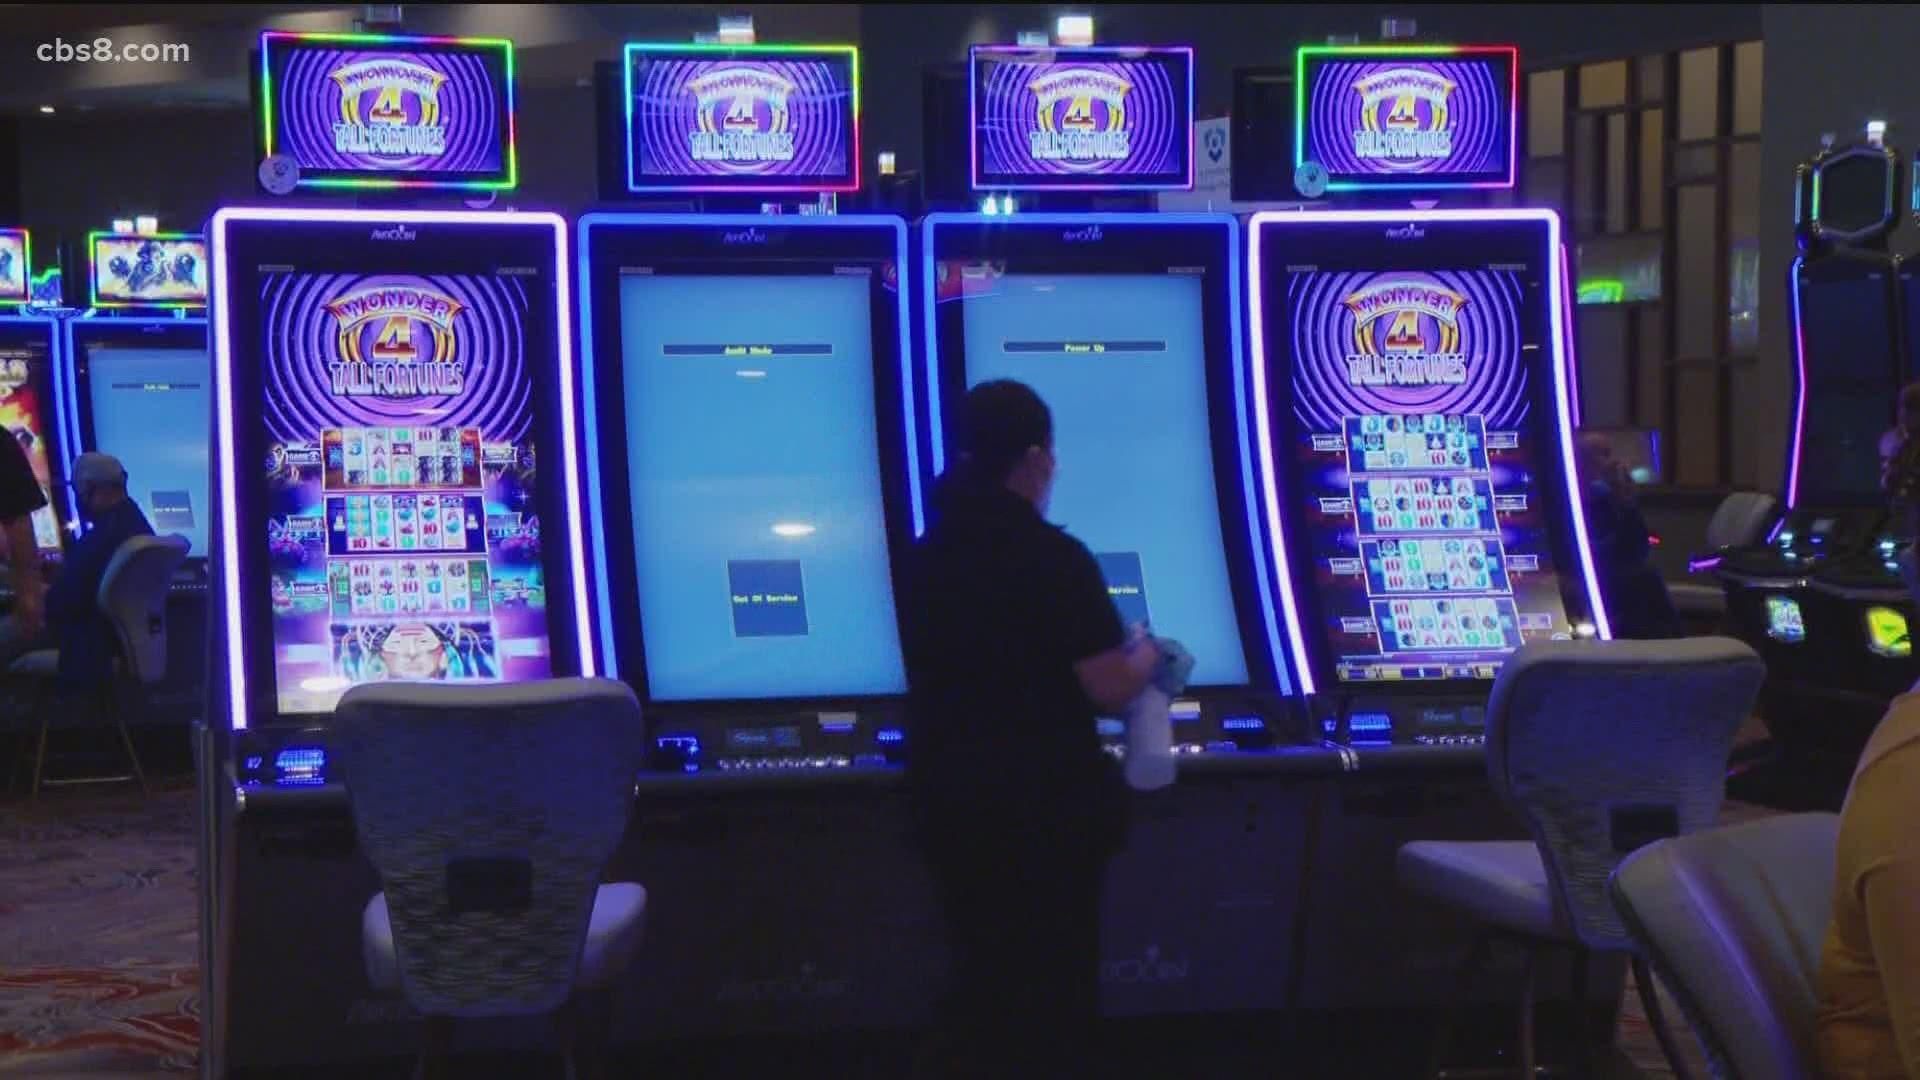 Valley View Casino App